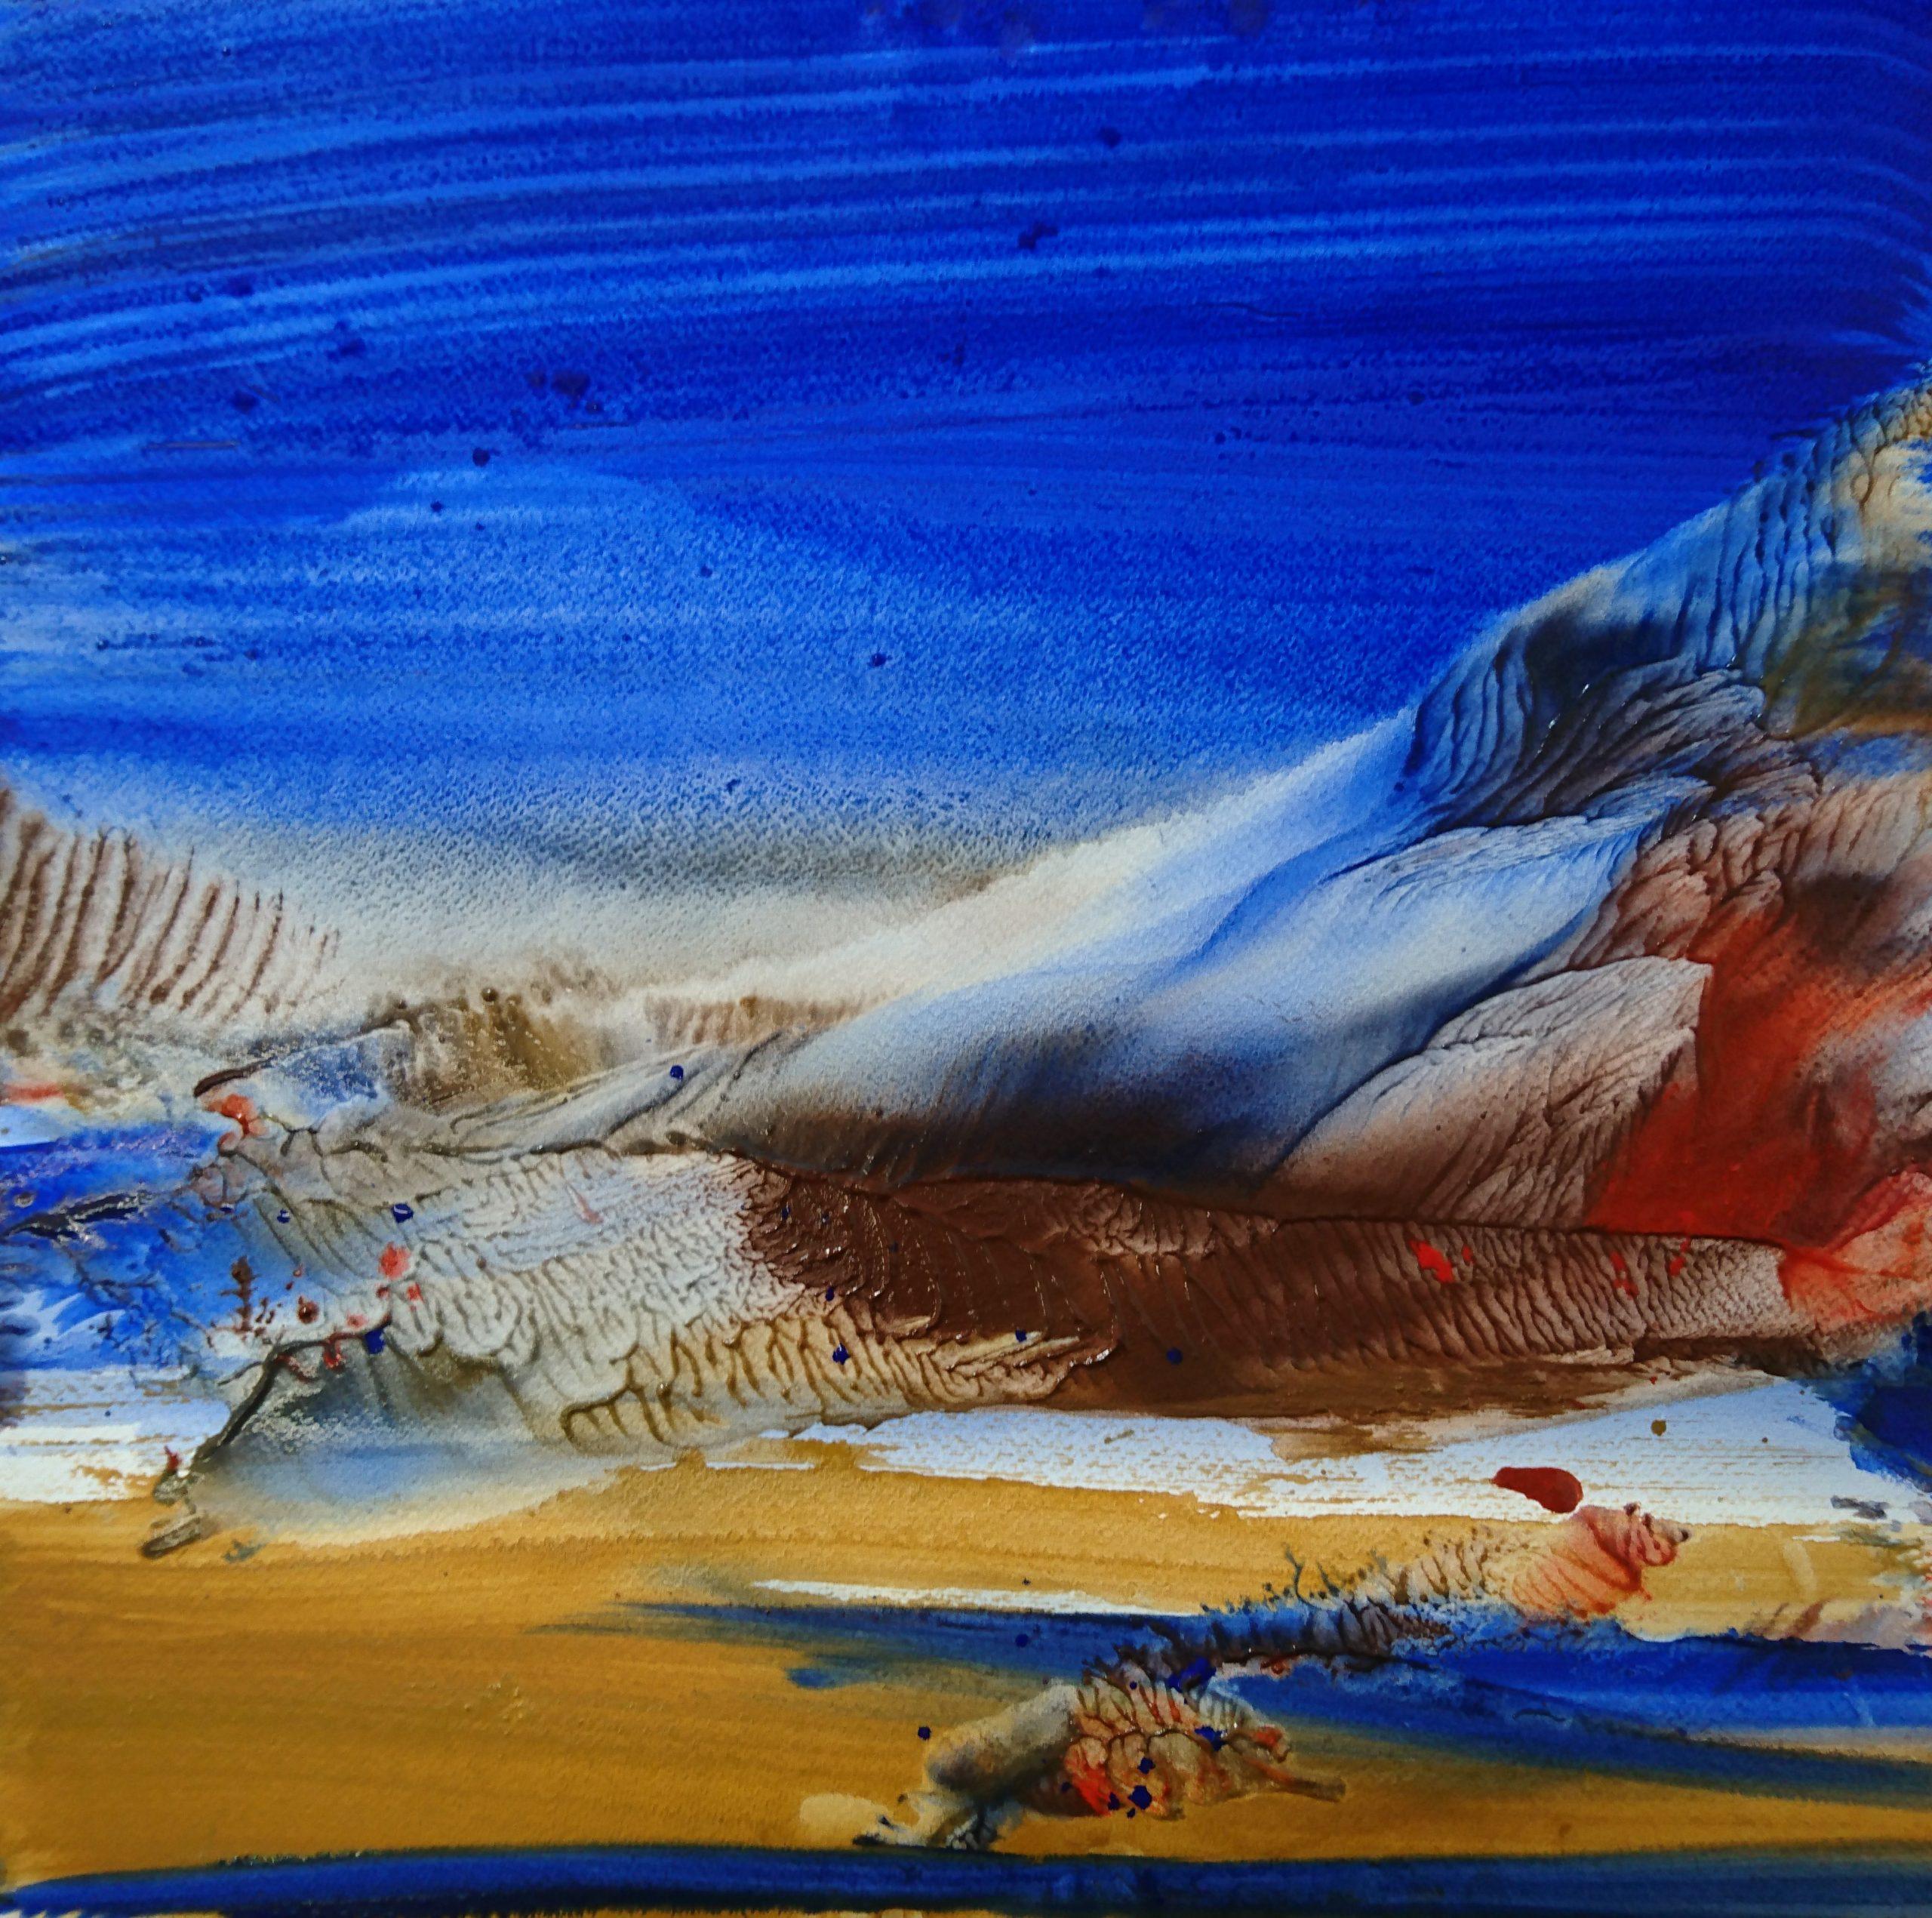 Littoral, tempera/paper/canvas, 40x40cm, 2019